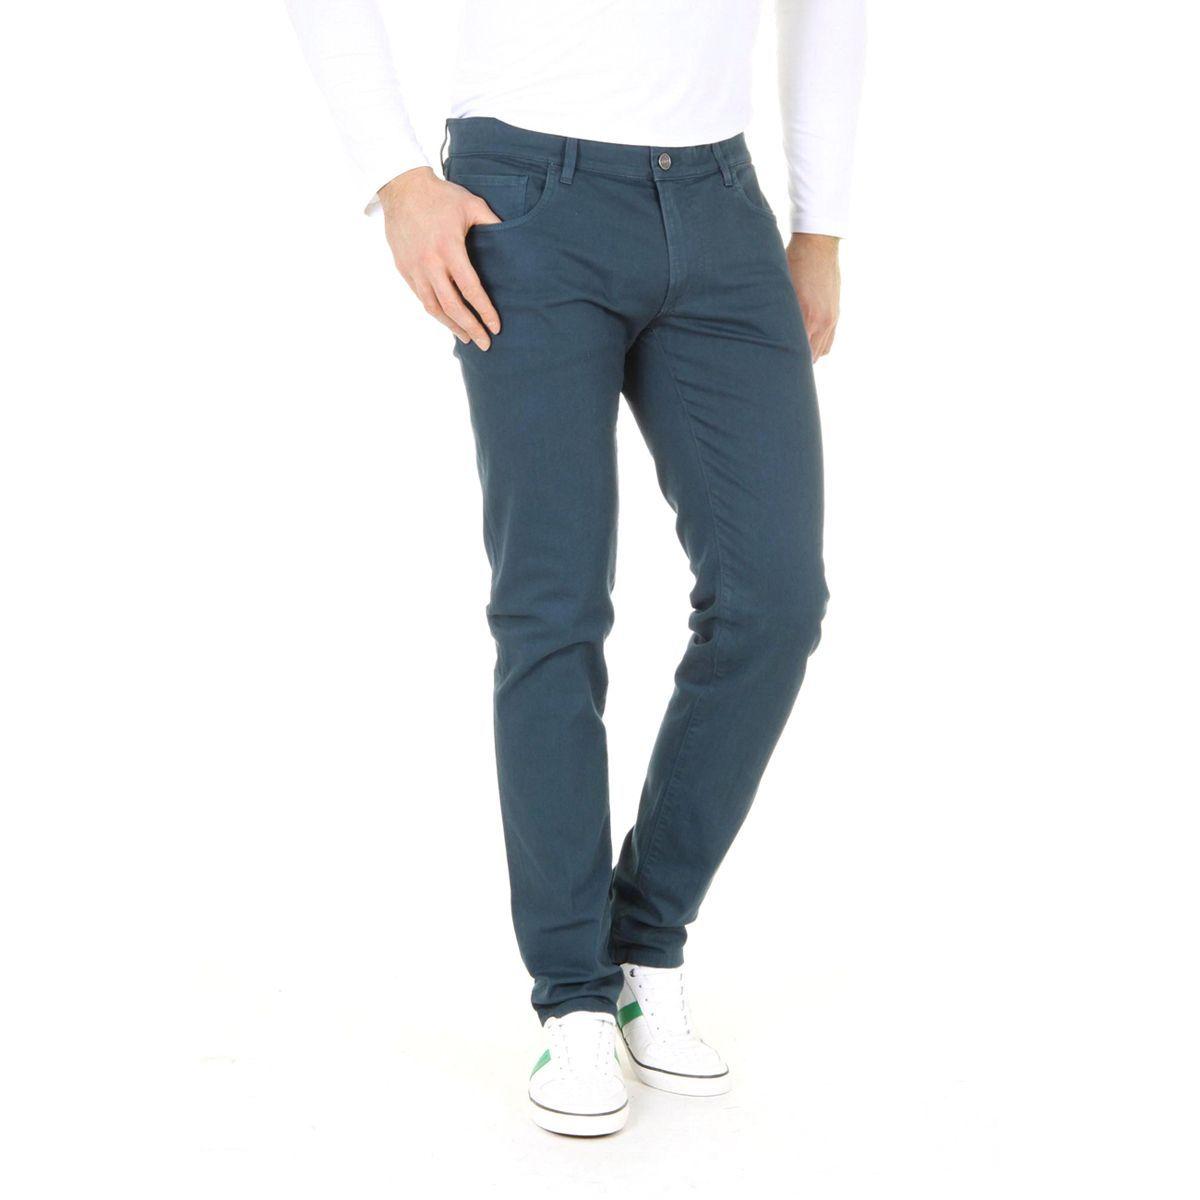 Dolce & Gabbana mens jeans G647LT G8Q45 B6724